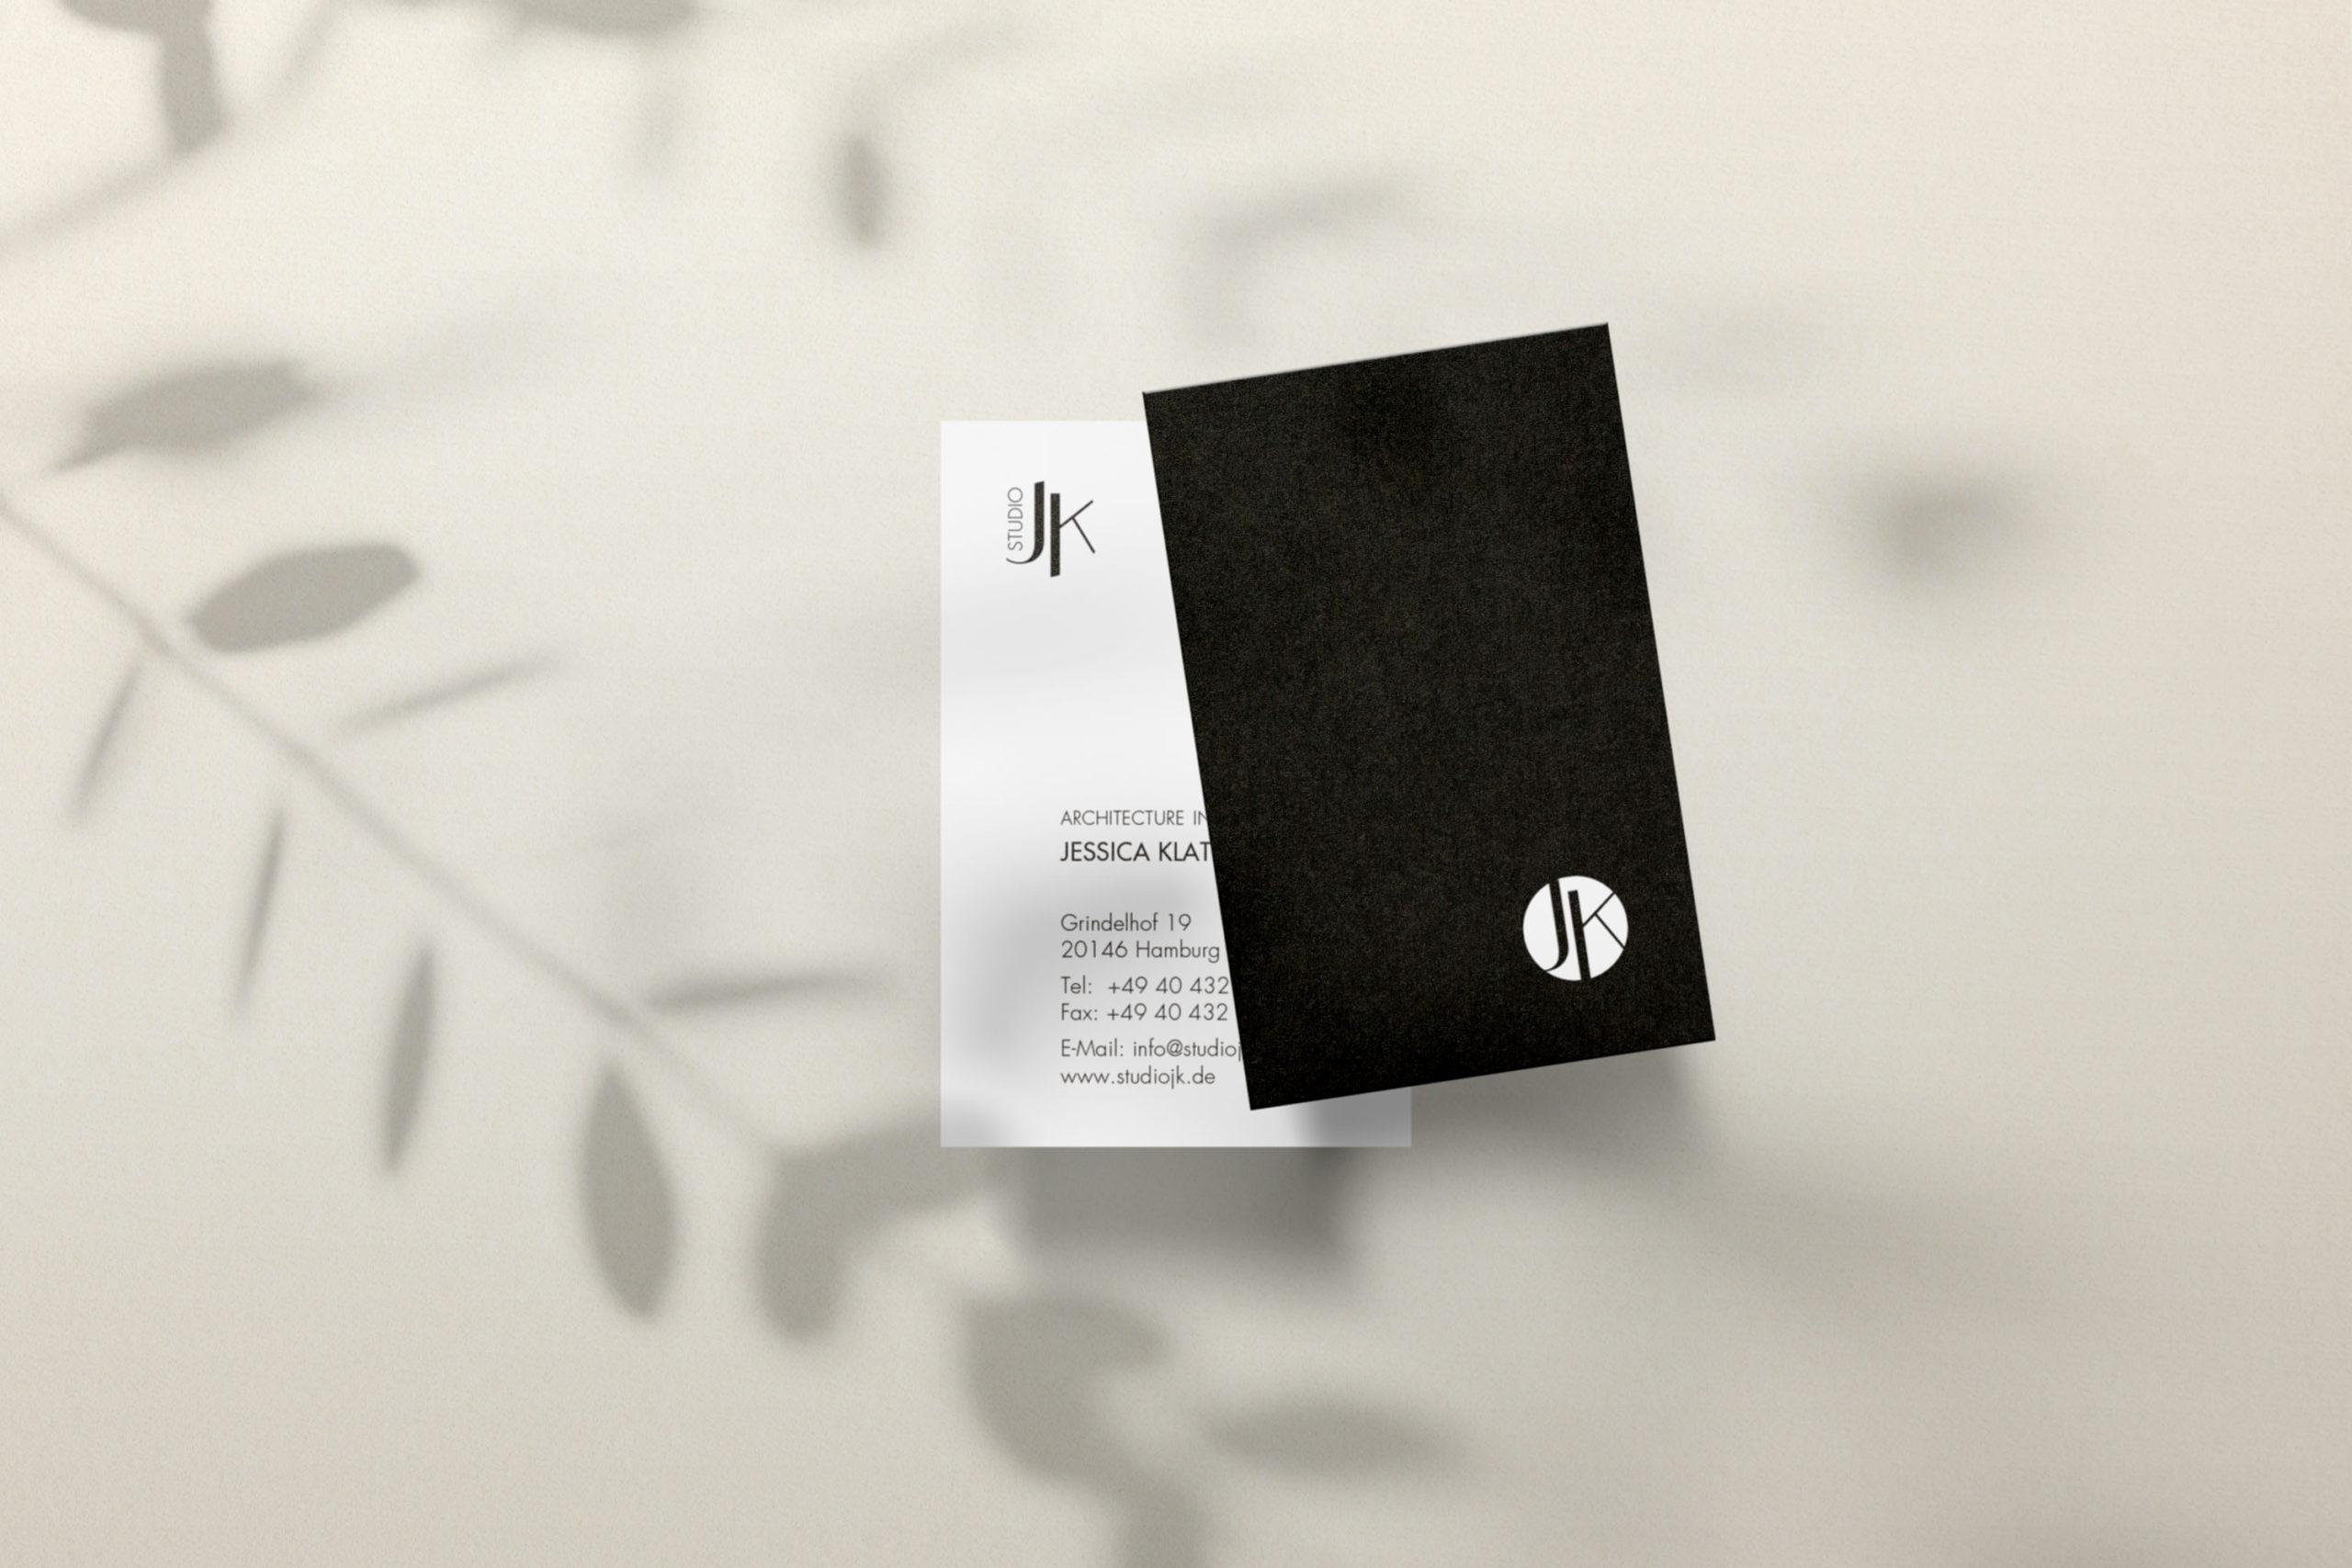 StudioJK | Architecture Interior Design / Branding